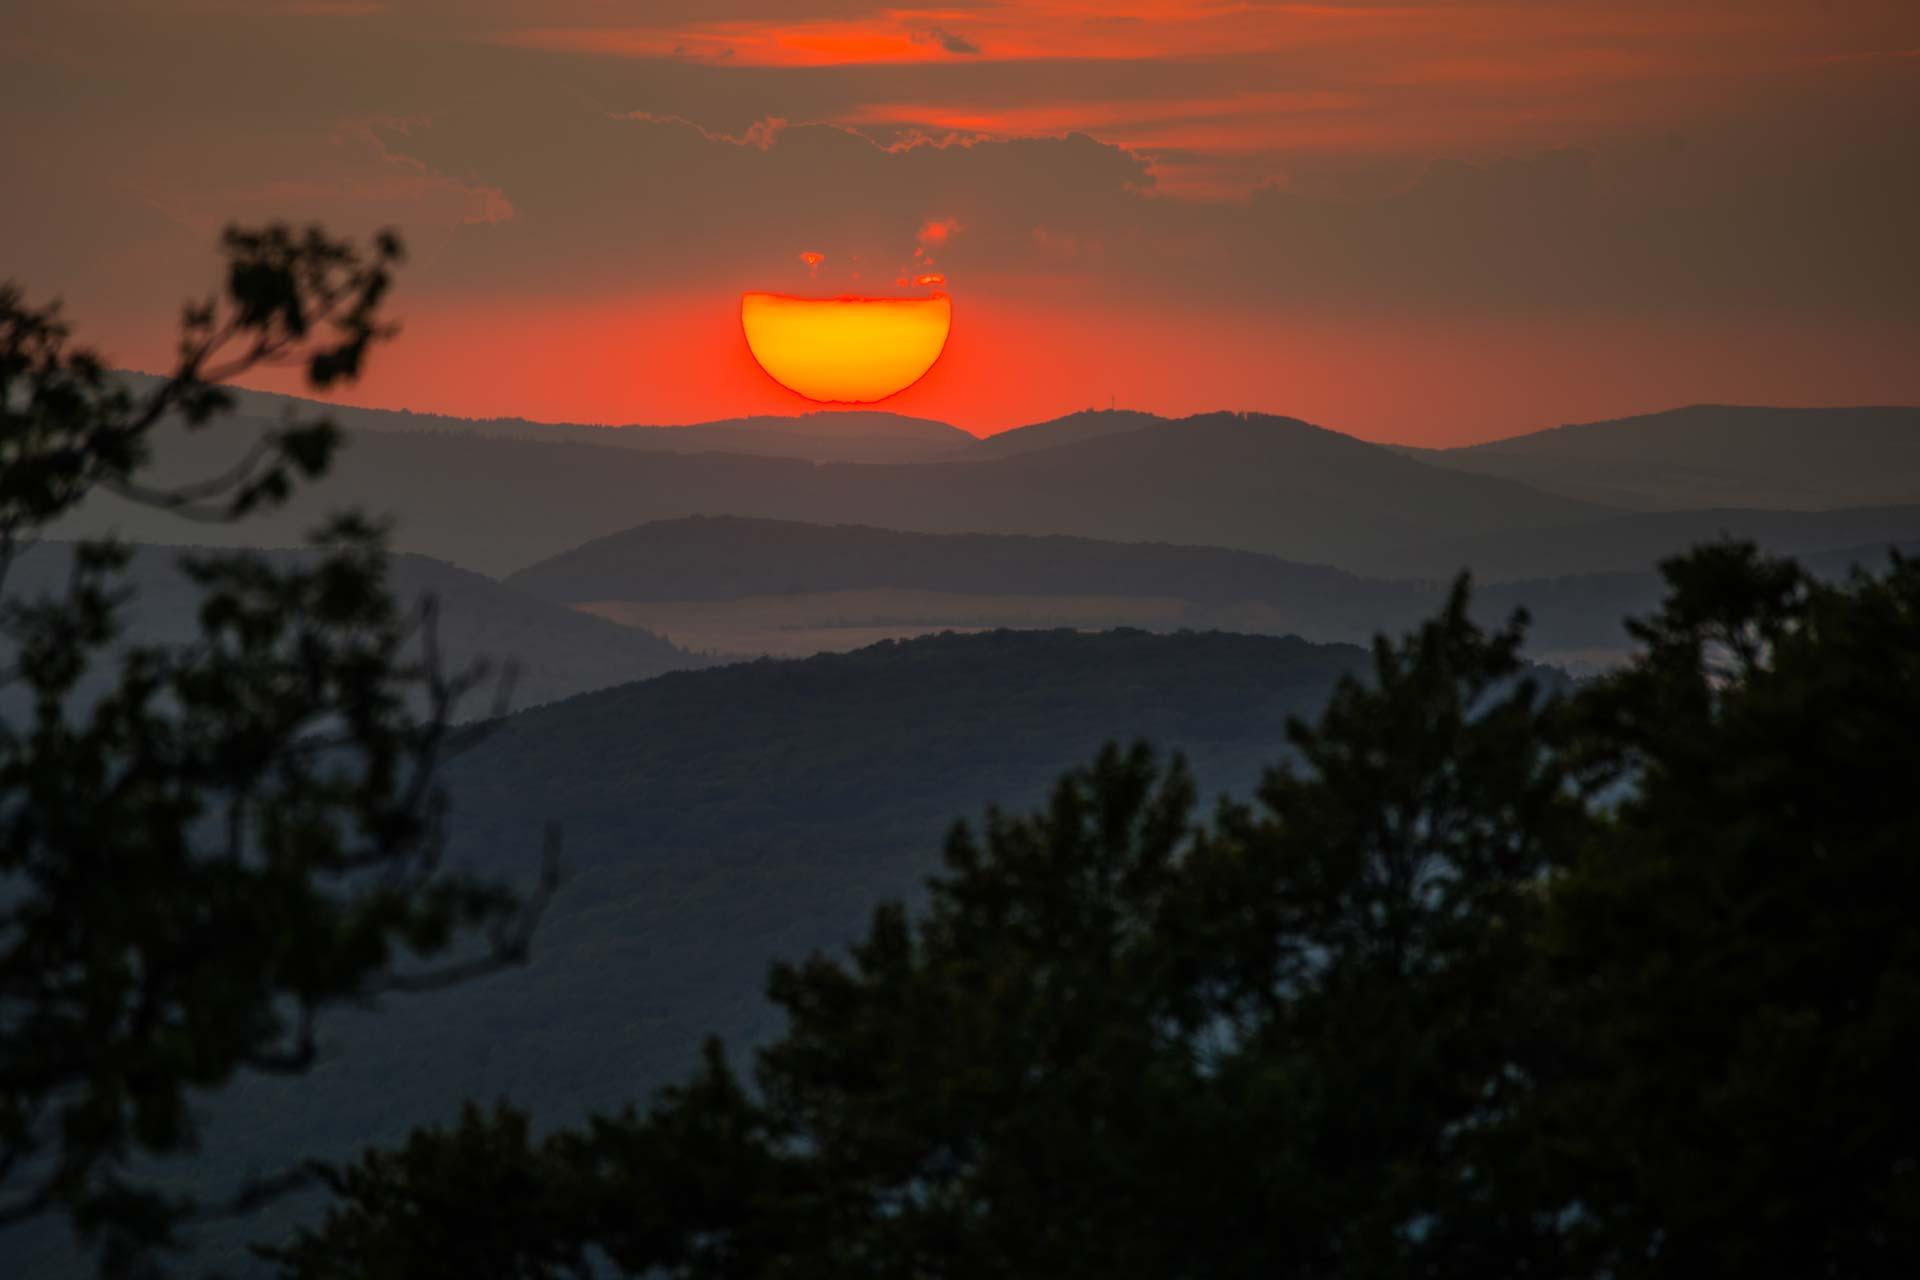 Landschaftsfotografie - Sonnenuntergang